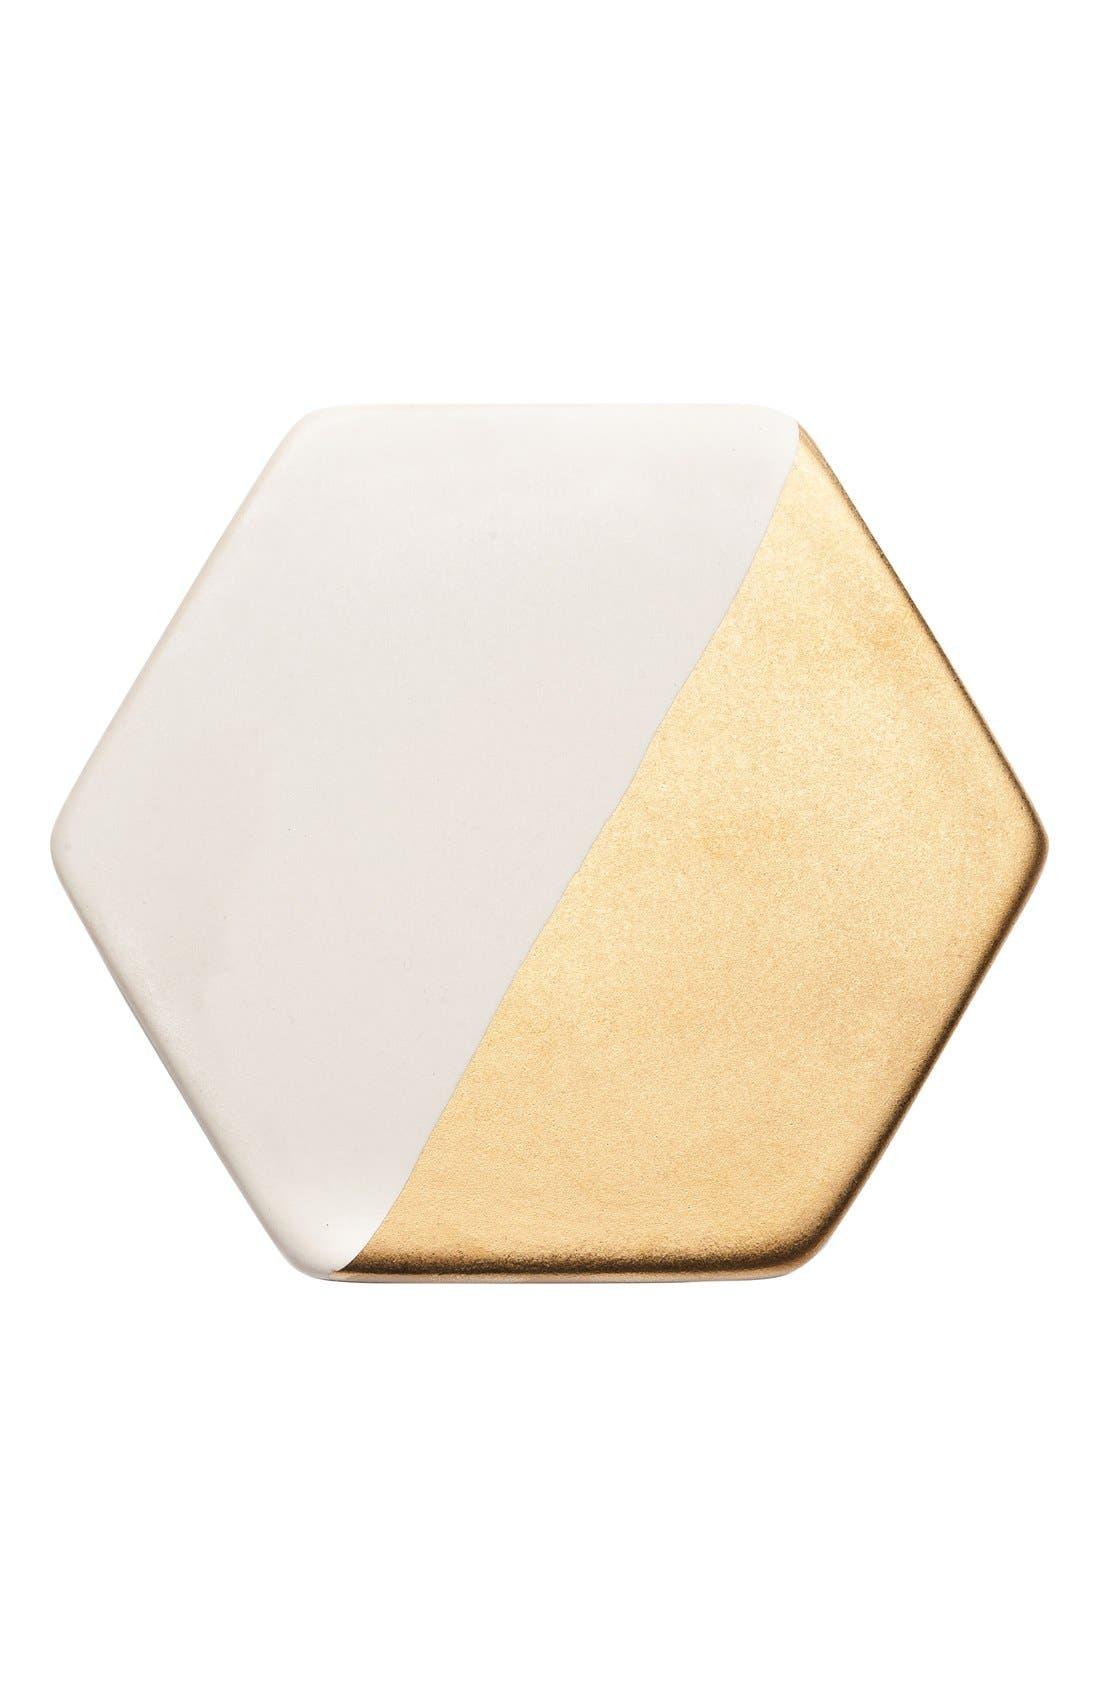 Alternate Image 2  - zestt 'Hampton' Gilded Ceramic Coasters (Set of 4)